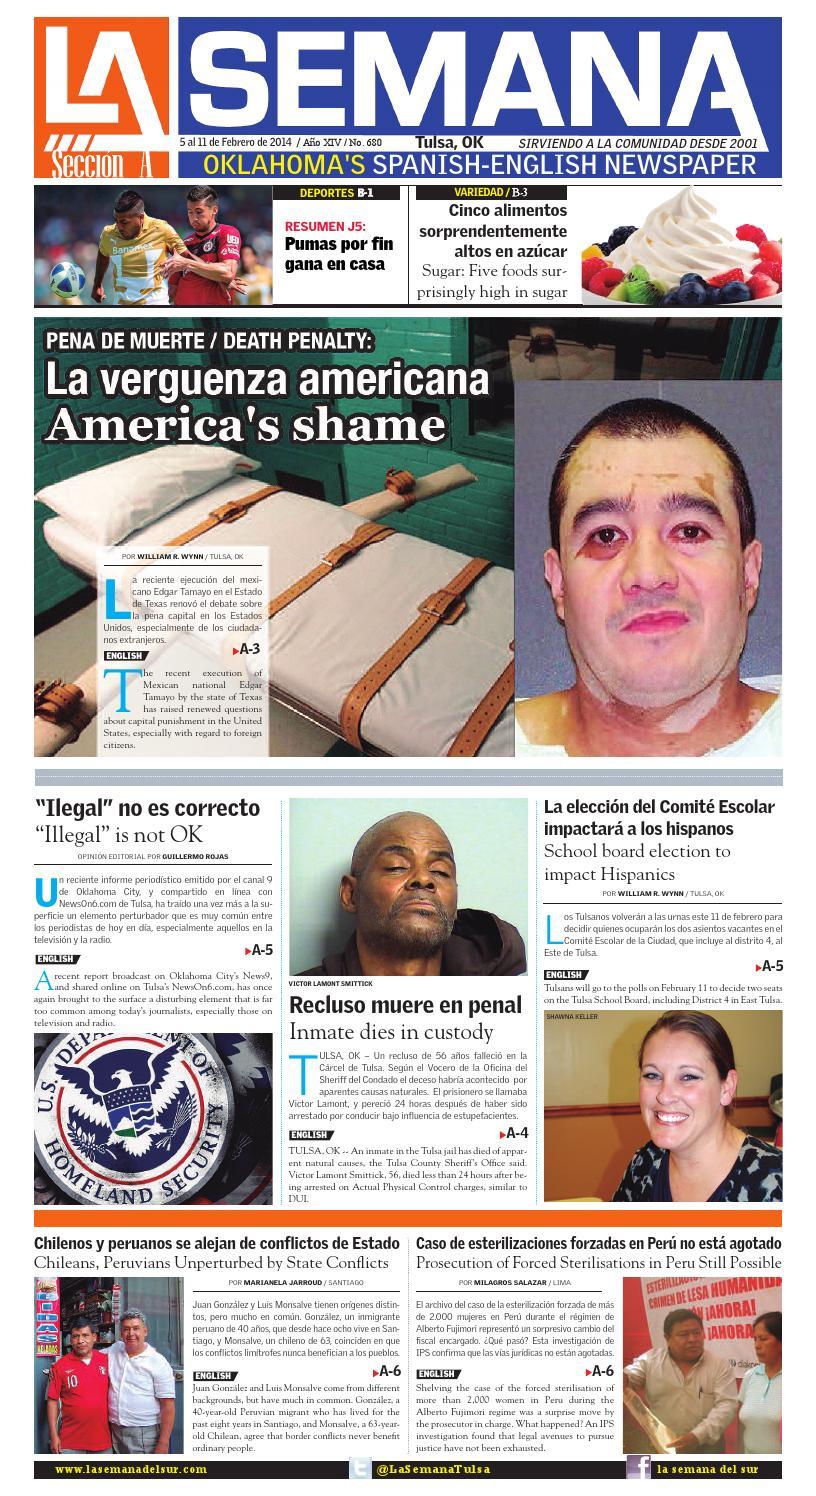 La semana edition 680 02052014 tulsa oklahoma usa by La Semana Del ...